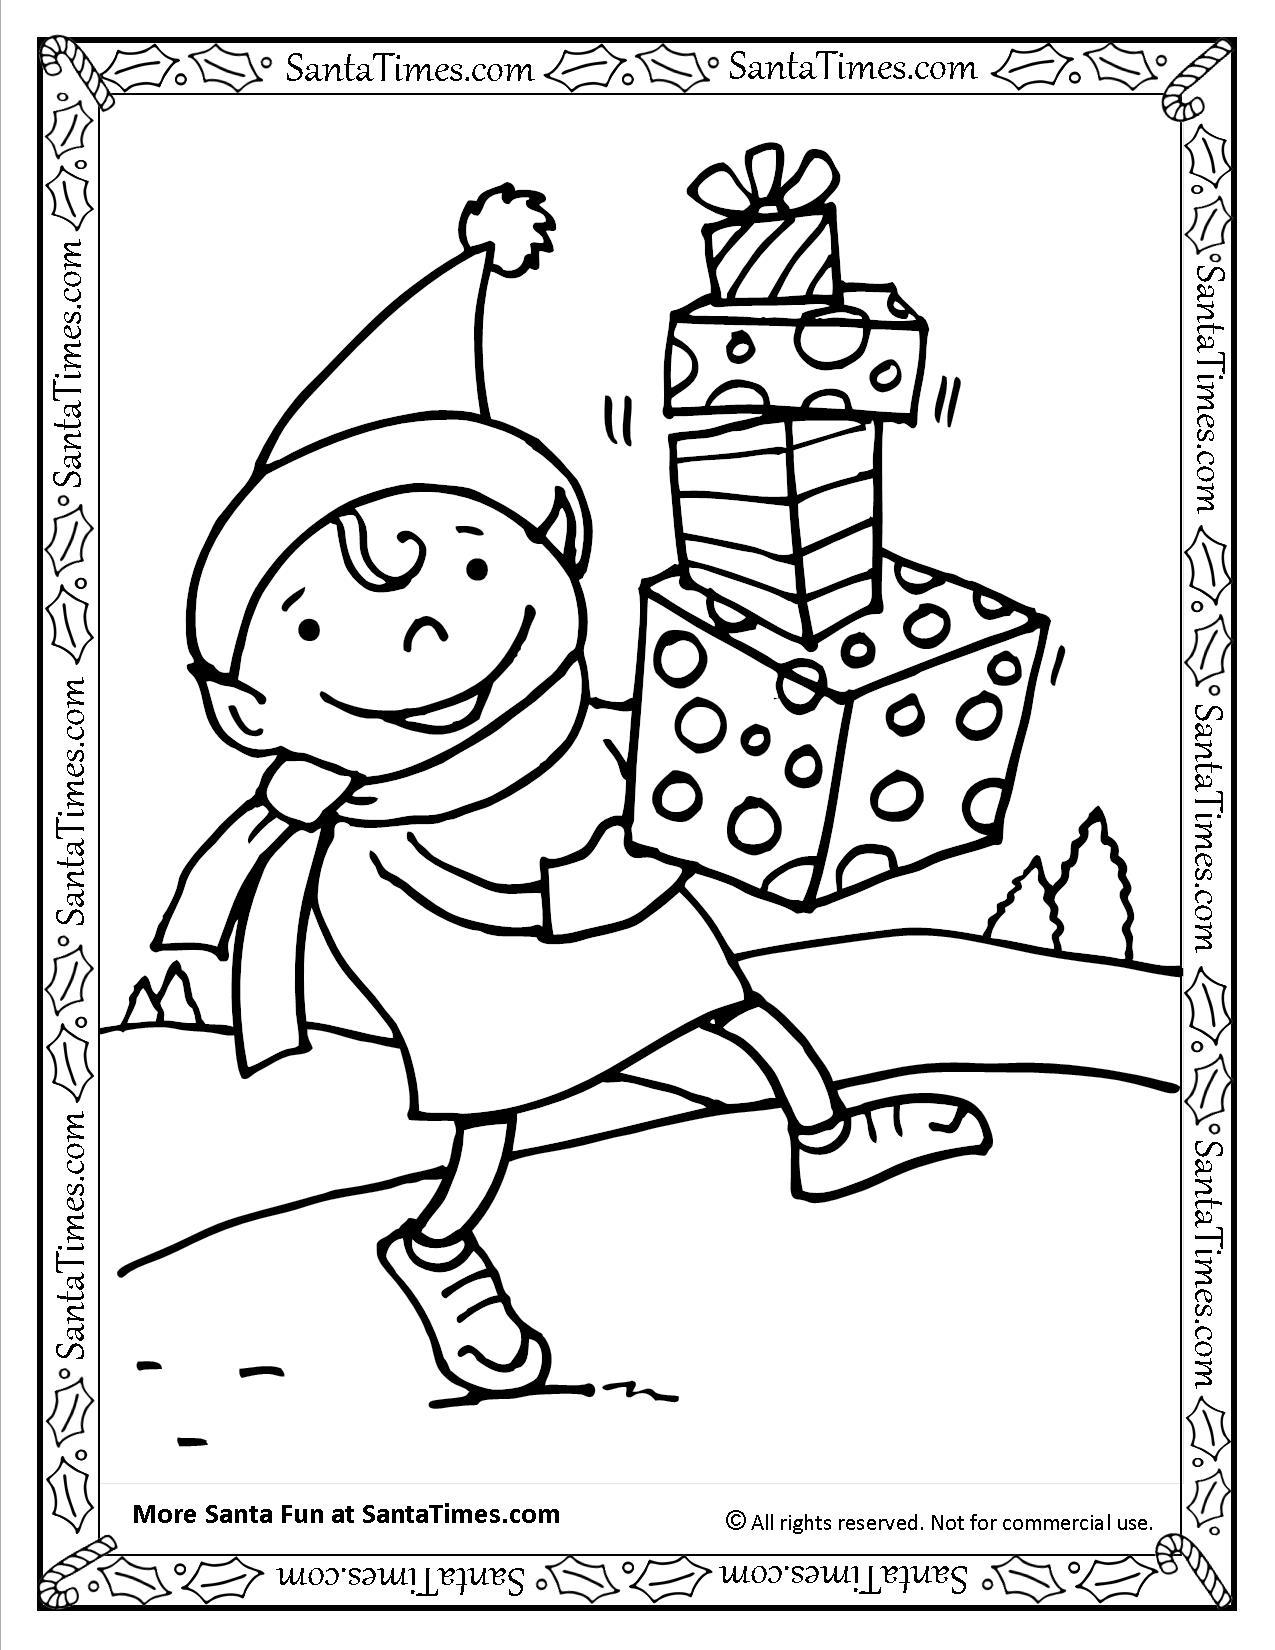 Santa And Elf Coloring Pages at GetDrawings | Free download